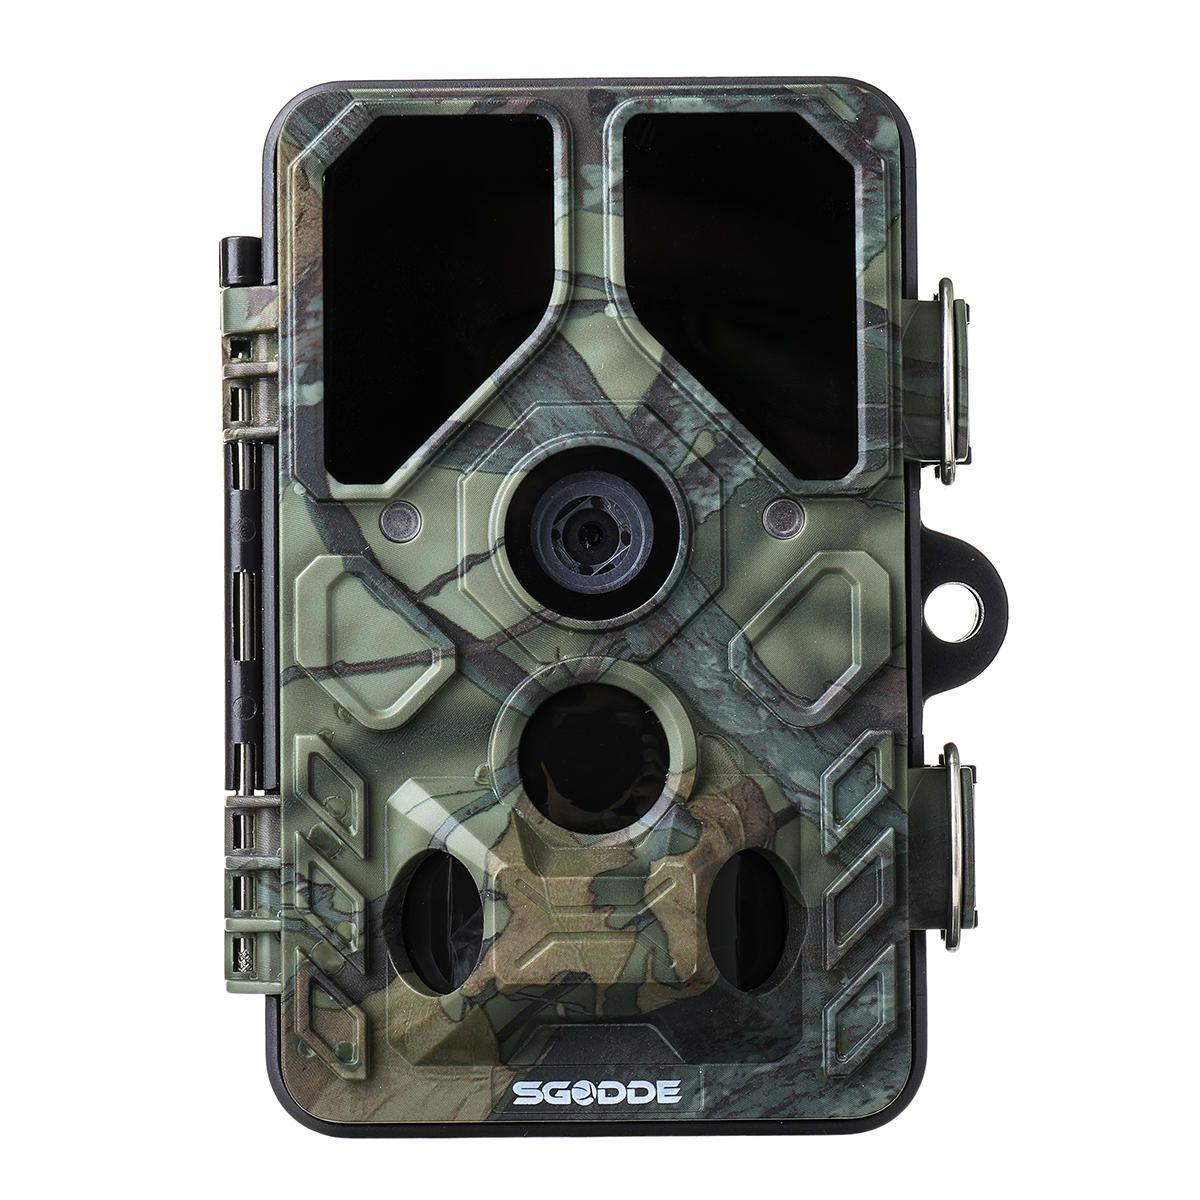 SGODDE 16MP 1080P 2.4Inch LCD Infrared Night Vision Hunting Camera Wide Angle Track Camera